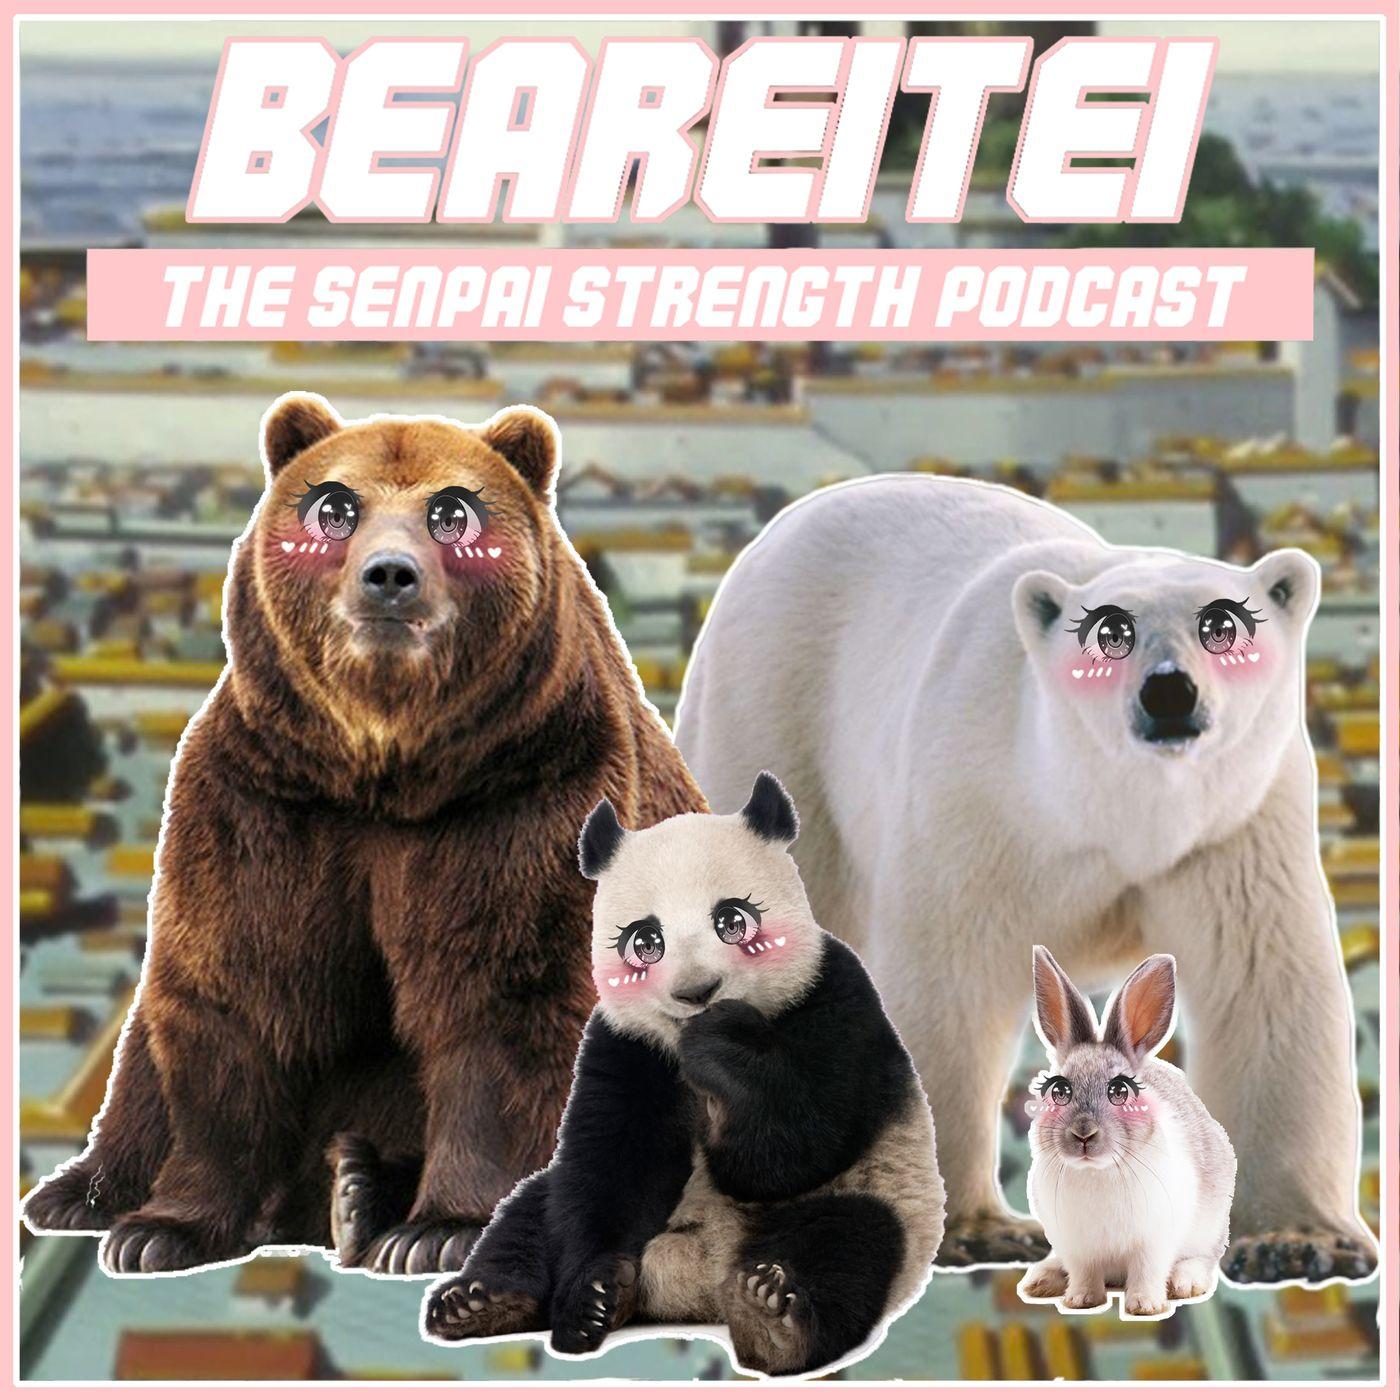 BEAREITEI 09: A TERRIBLE HIME INTERVINES